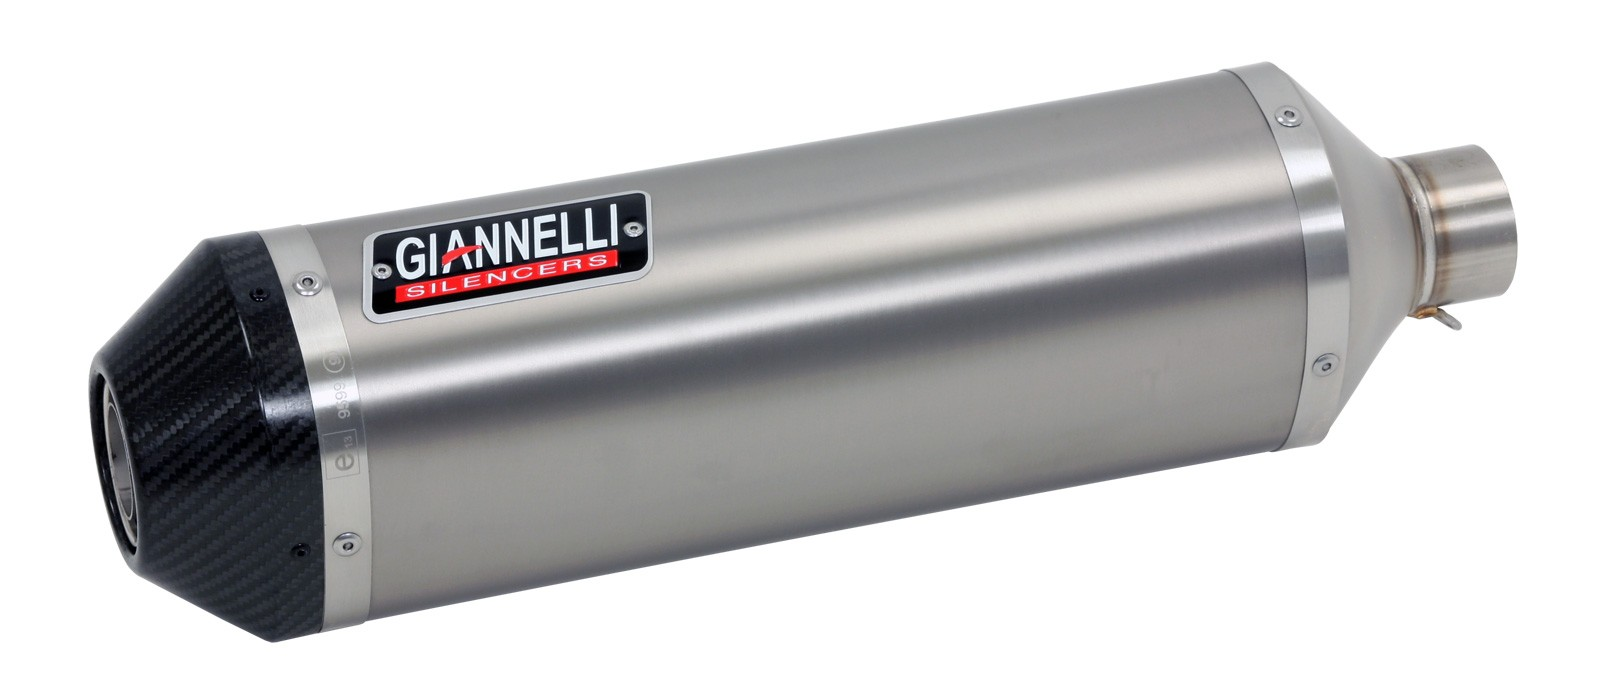 ESCAPES GIANNELLI HONDA - Sistema completo IPERSPORT Silenciador aluminio versión Black Line Honda CBR 300 R Giannelli